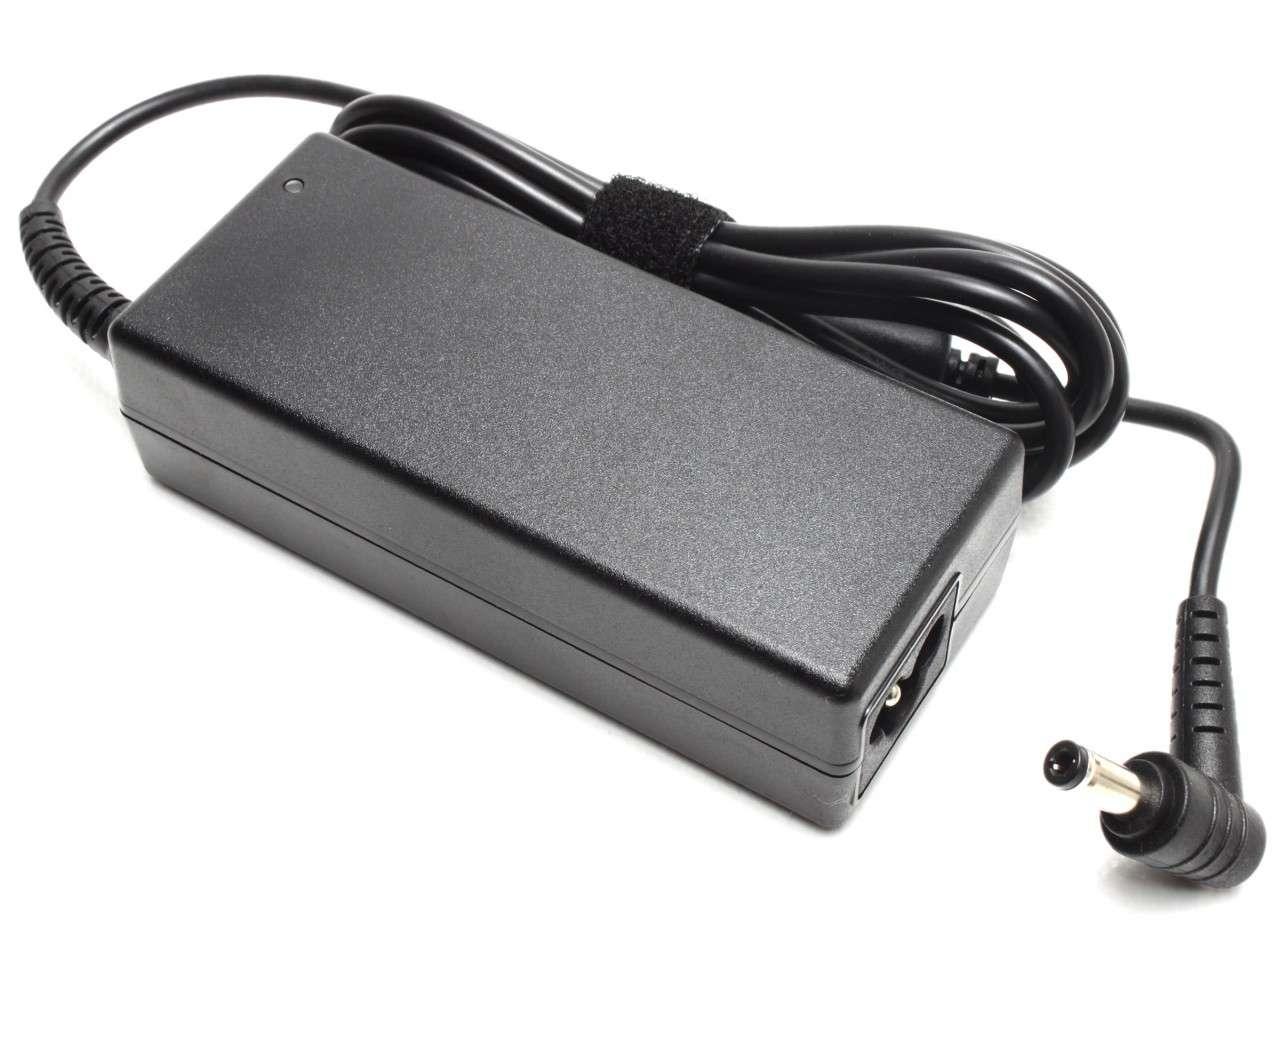 Incarcator Philips Freevents X60 imagine powerlaptop.ro 2021